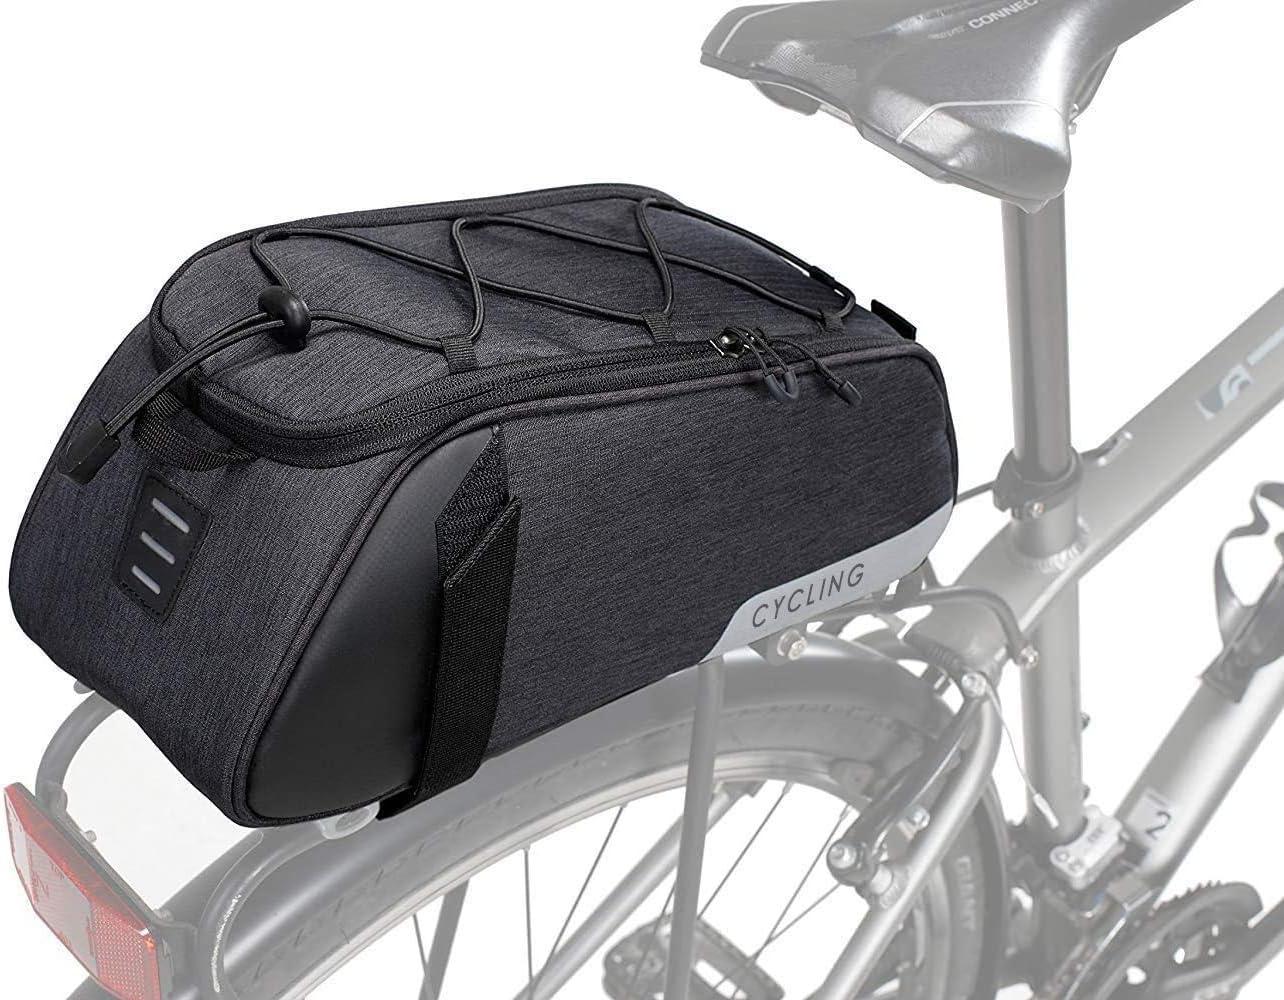 8L Bike Rear Seat Bag Bicycle Backseat Cycling Pannier Rack Trunk Storage Bag